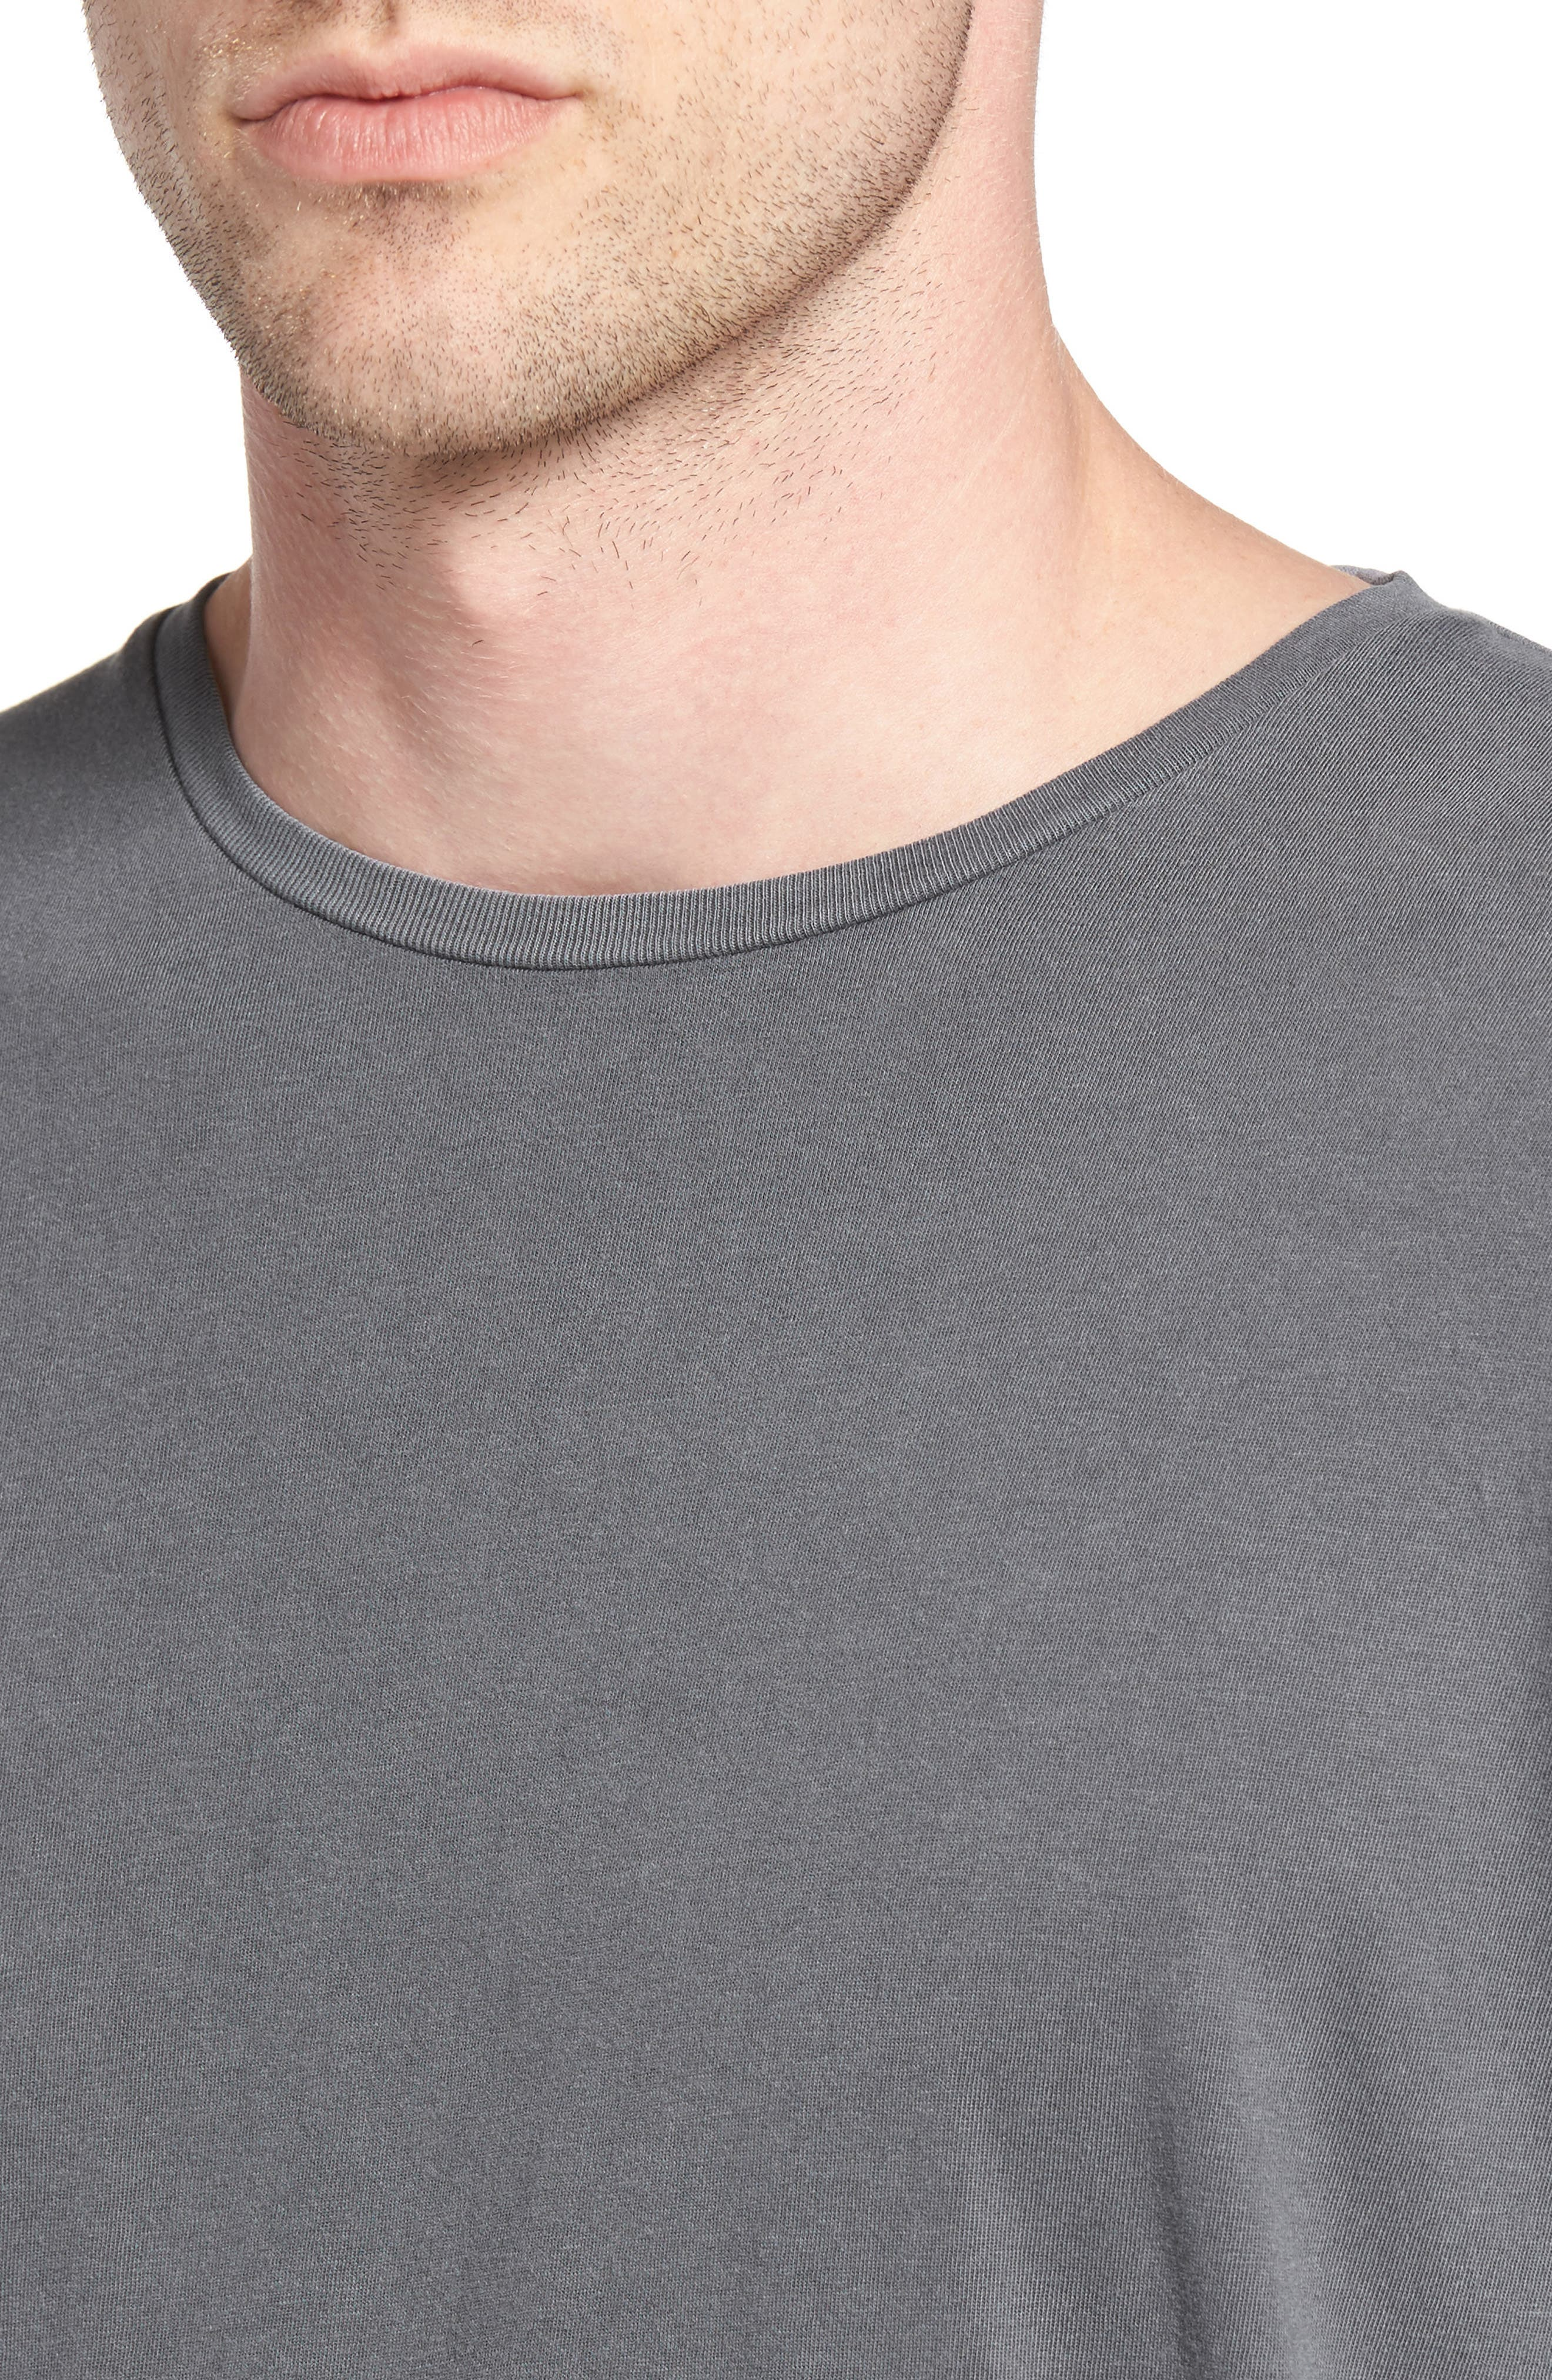 Flintlock Longline T-Shirt,                             Alternate thumbnail 4, color,                             029